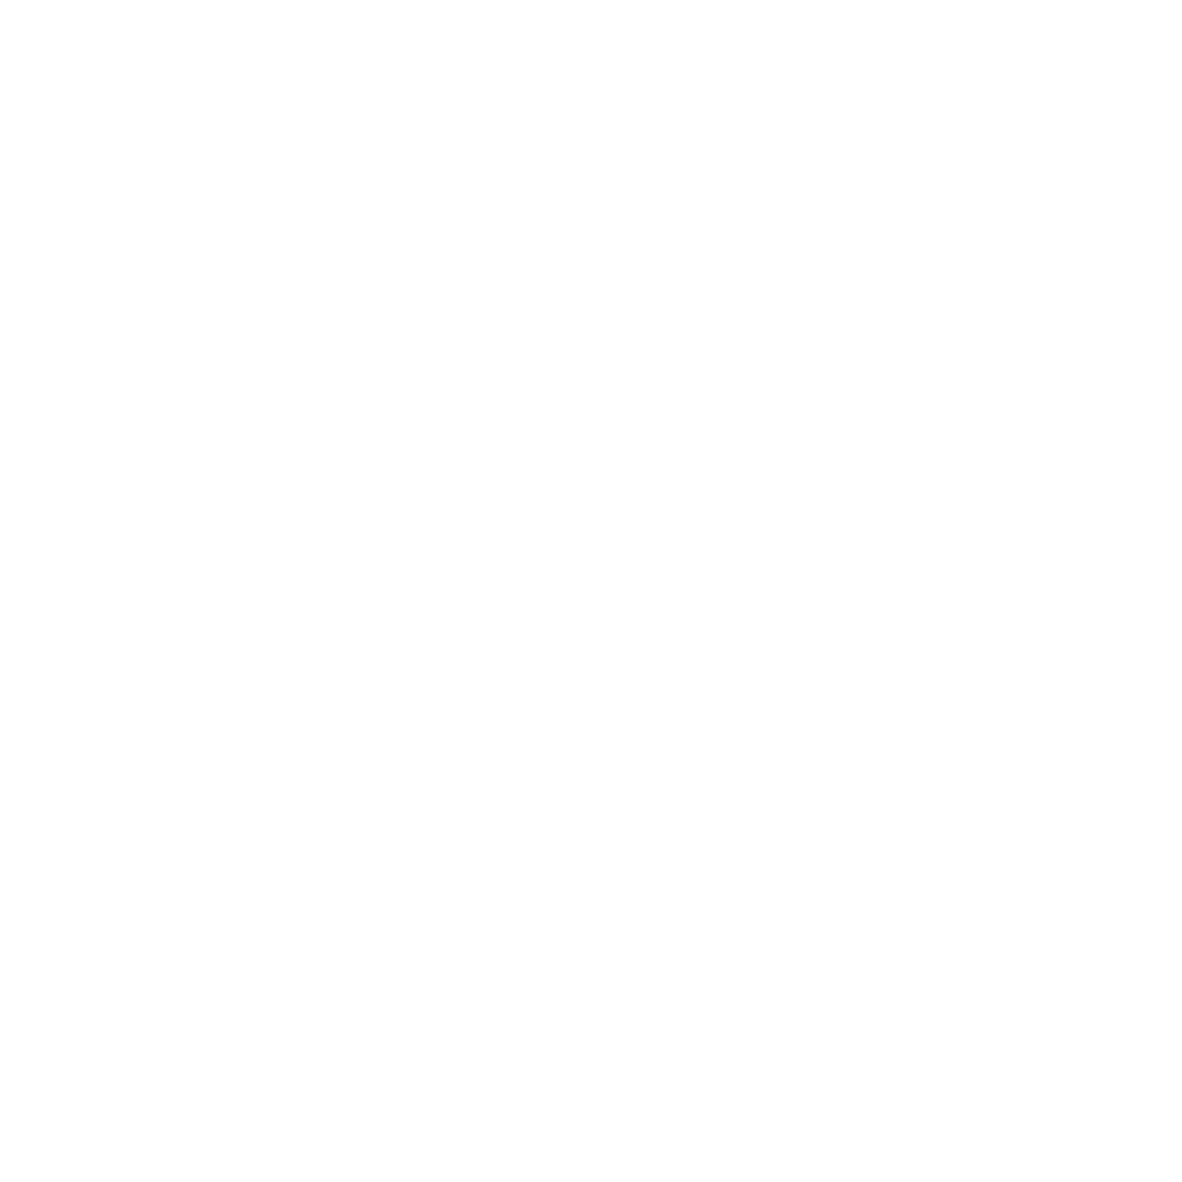 TransformativeTilingLogoWhite